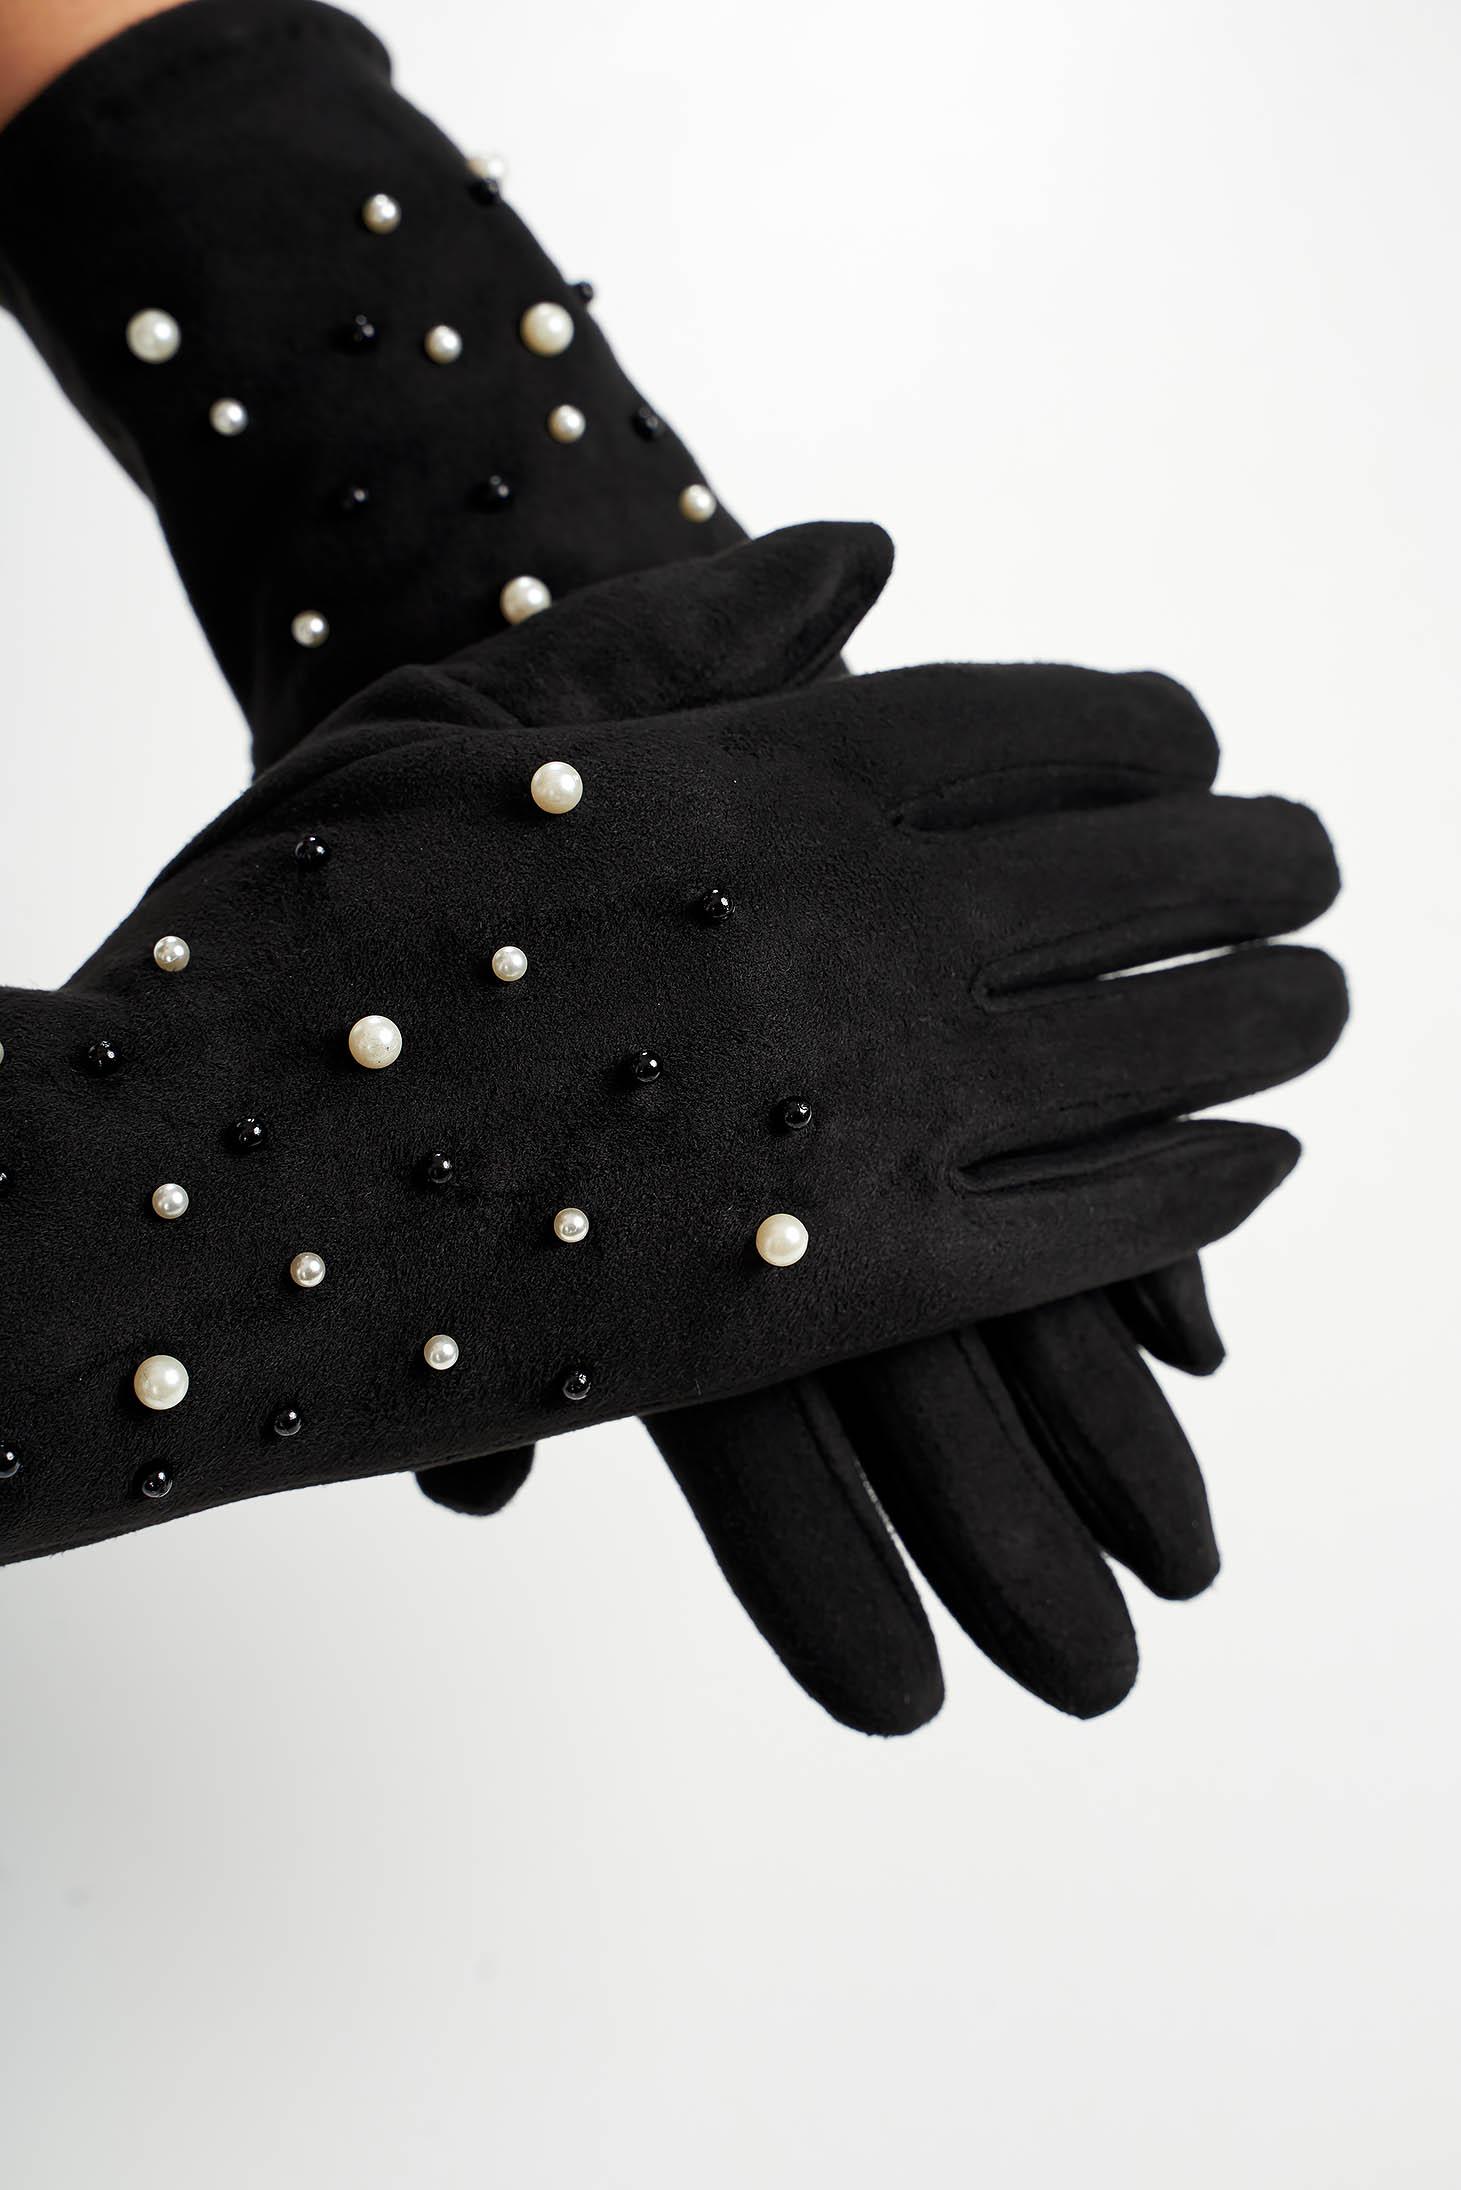 Manusi dama SunShine negre din material catifelat cu aplicatii cu perle